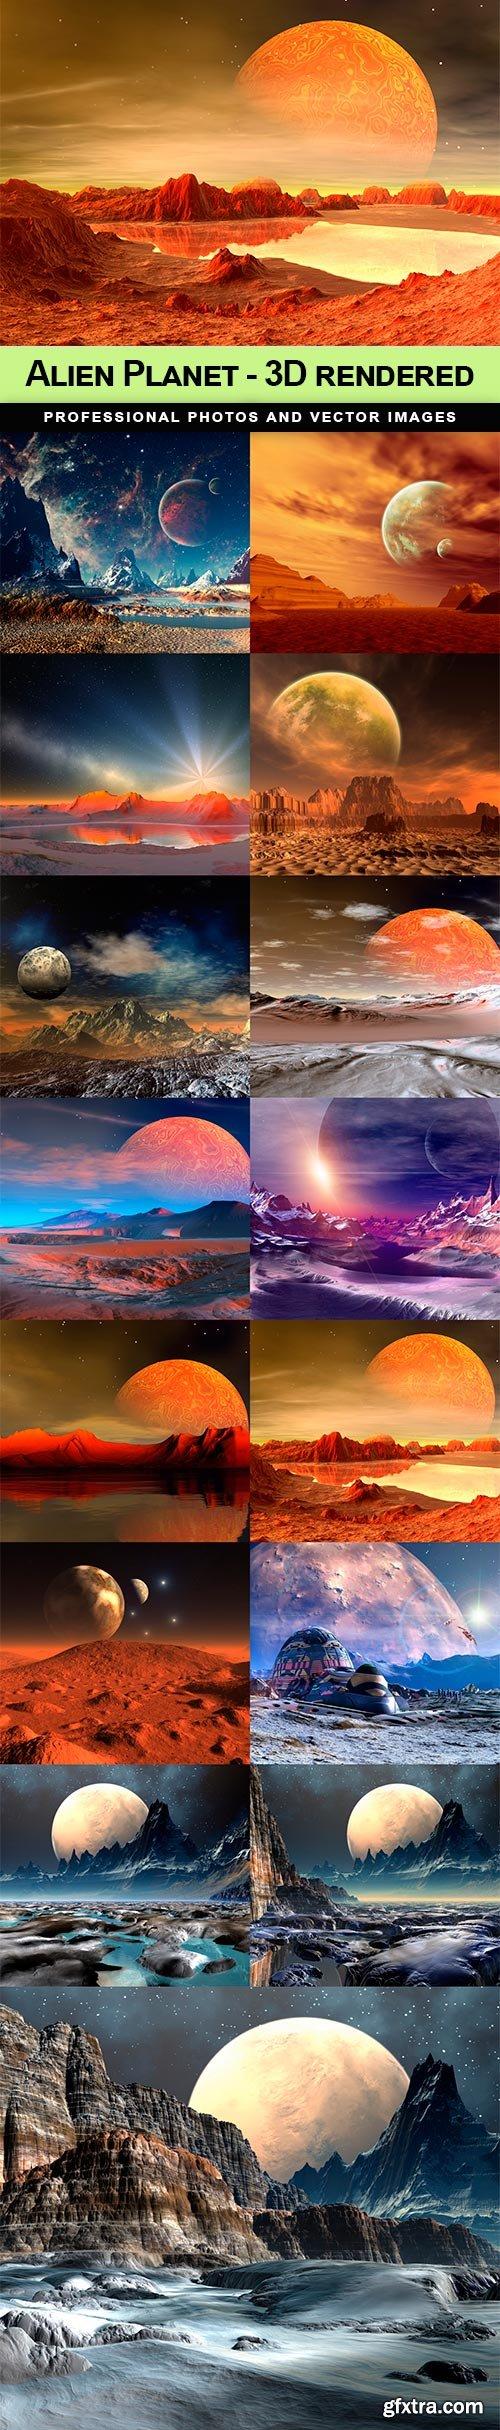 Alien Planet - 3D rendered - 15 UHQ JPEG